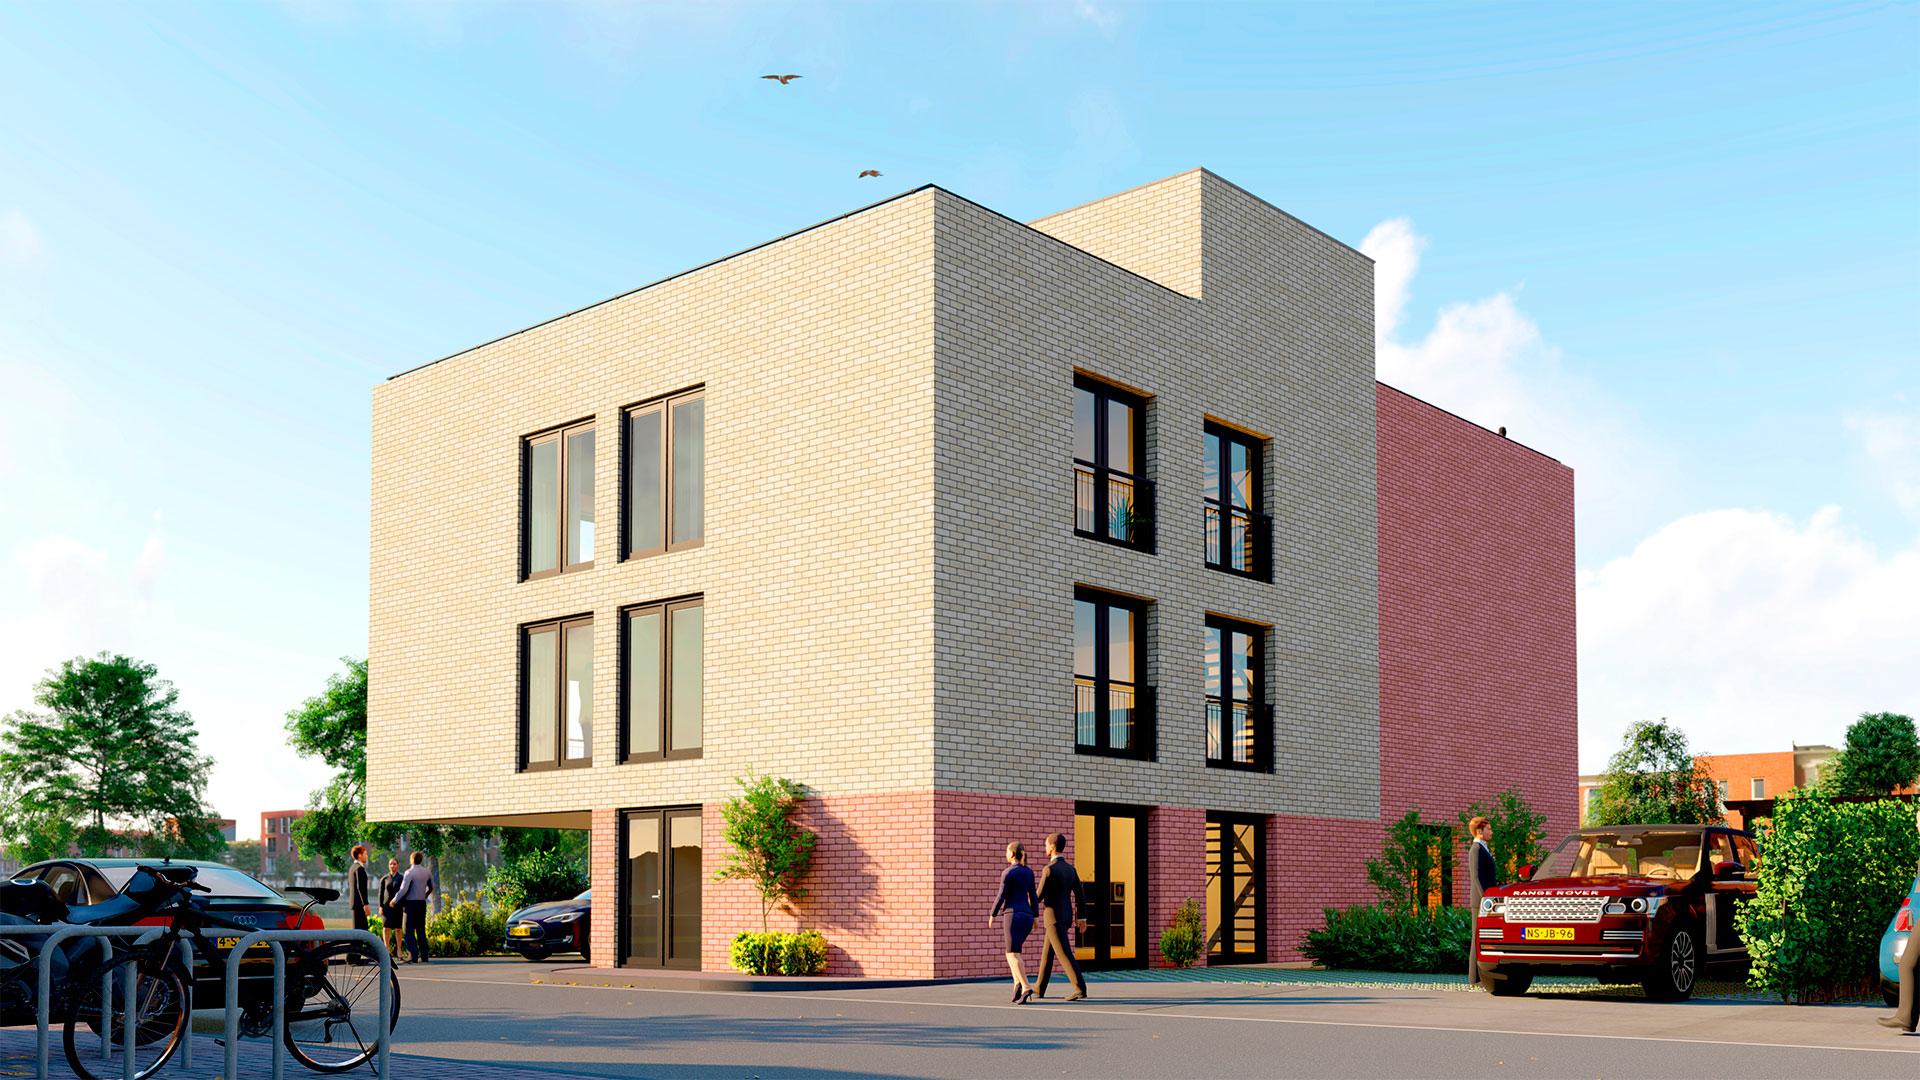 nexis-urban-villas-hoek-unit.jpg